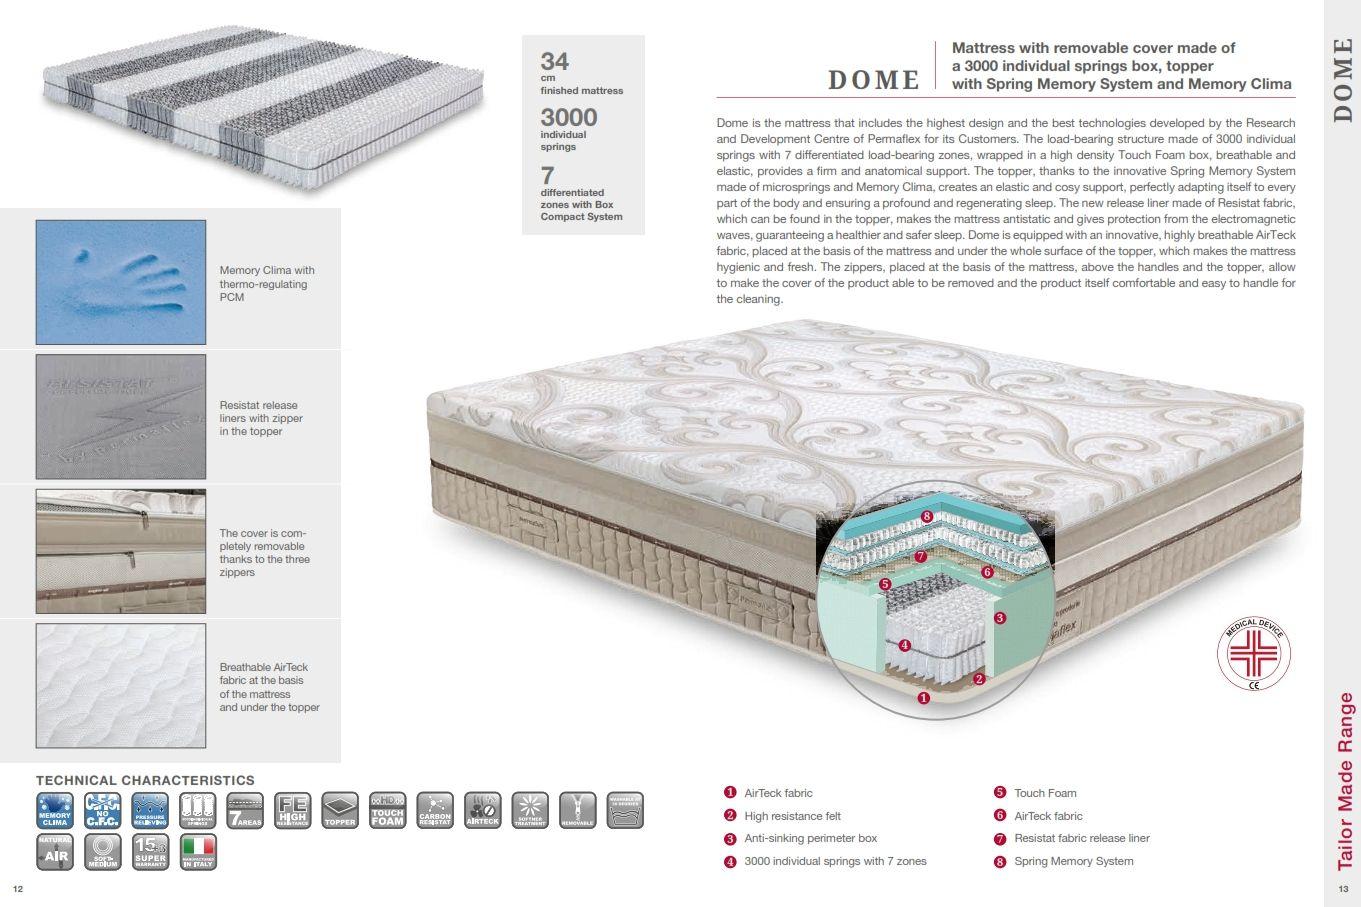 luxus matratzen permaflex matratze deluxe dome seriedie m bel aus italien. Black Bedroom Furniture Sets. Home Design Ideas